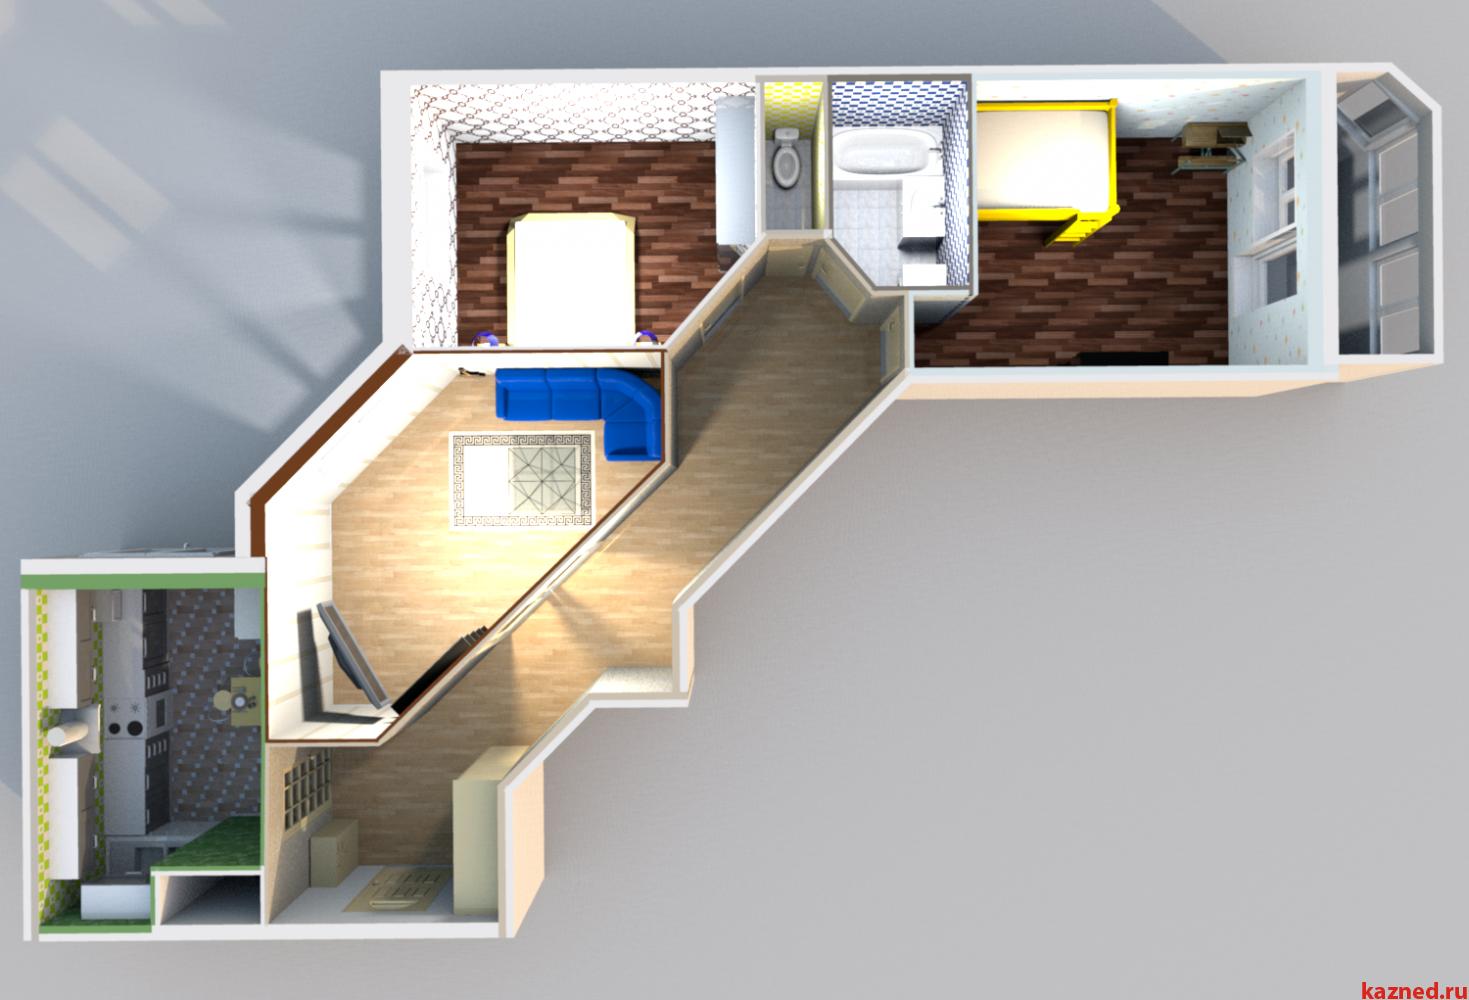 Продажа 3-к квартиры Годовикова/Лукина, 91 м²  (миниатюра №2)